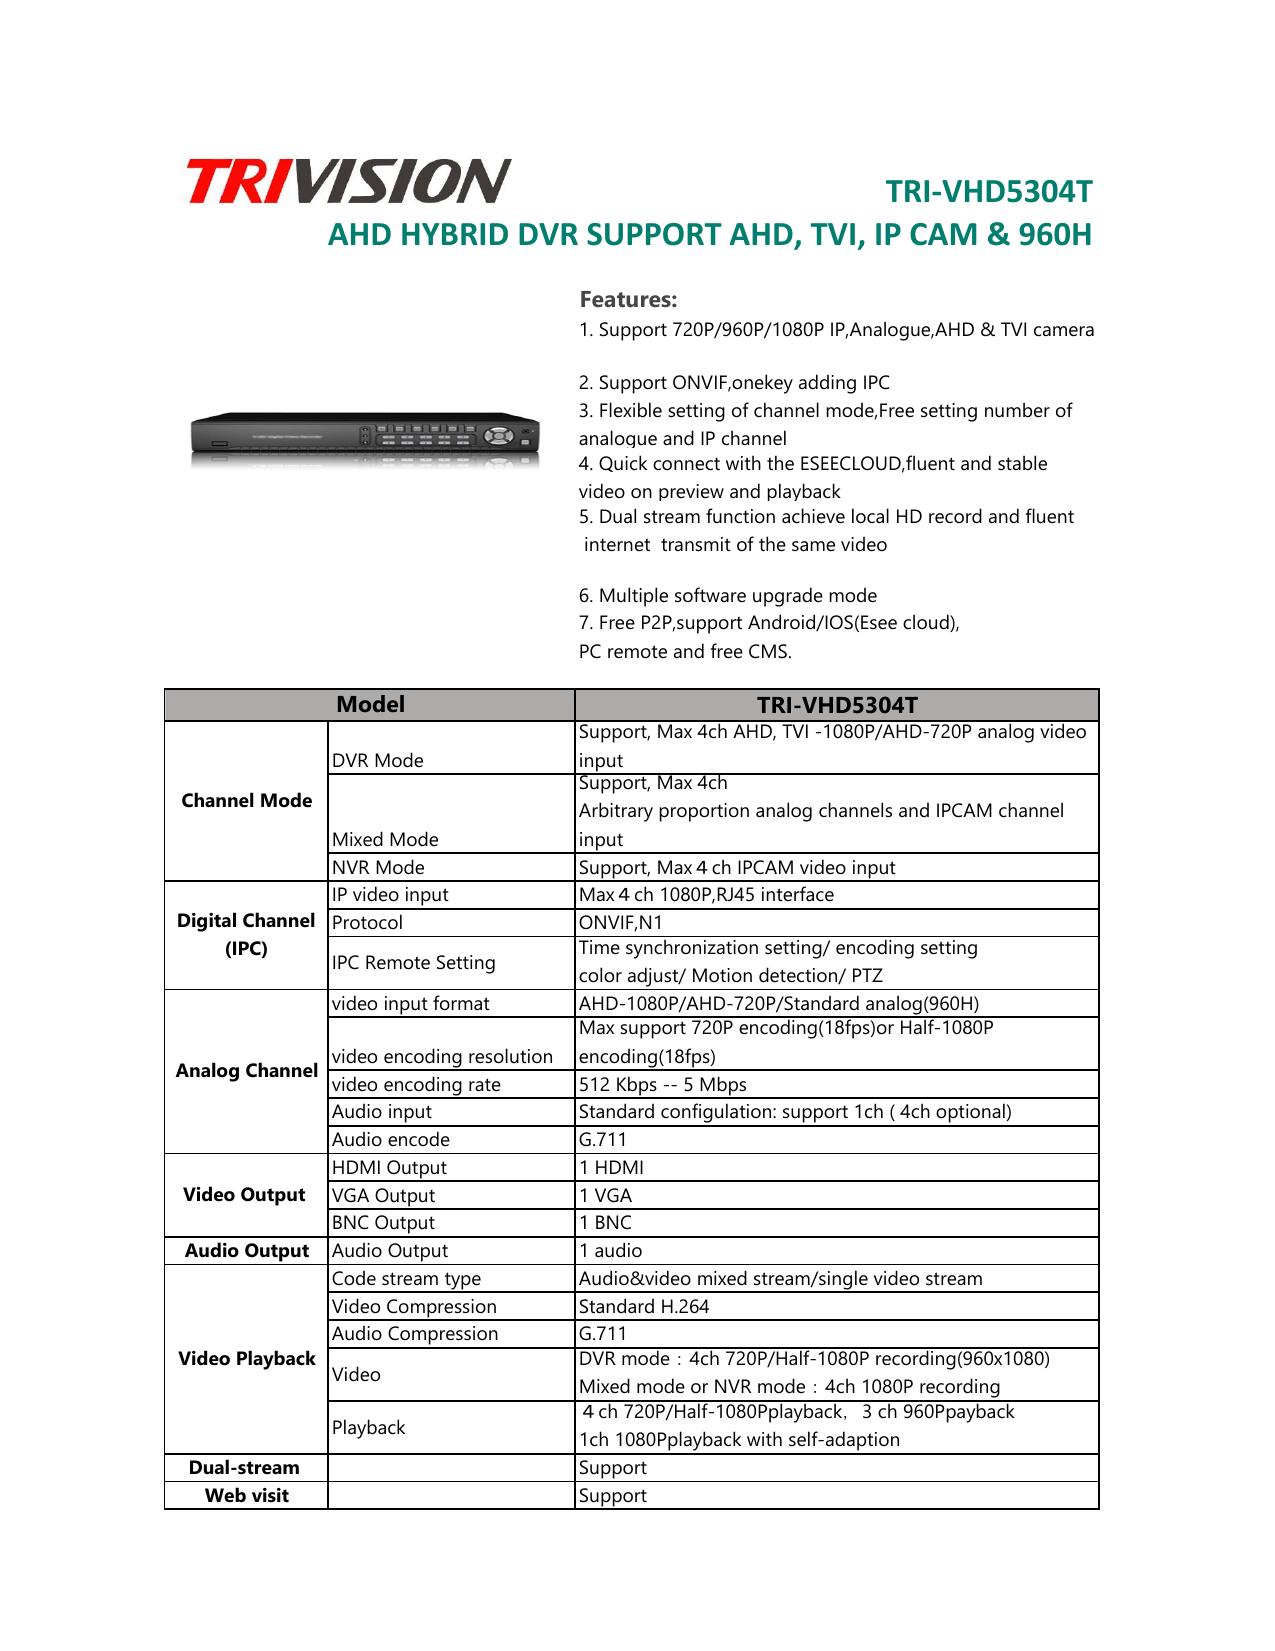 tri-vhd5304t ahd hybrid dvr support ahd, tvi, ip cam